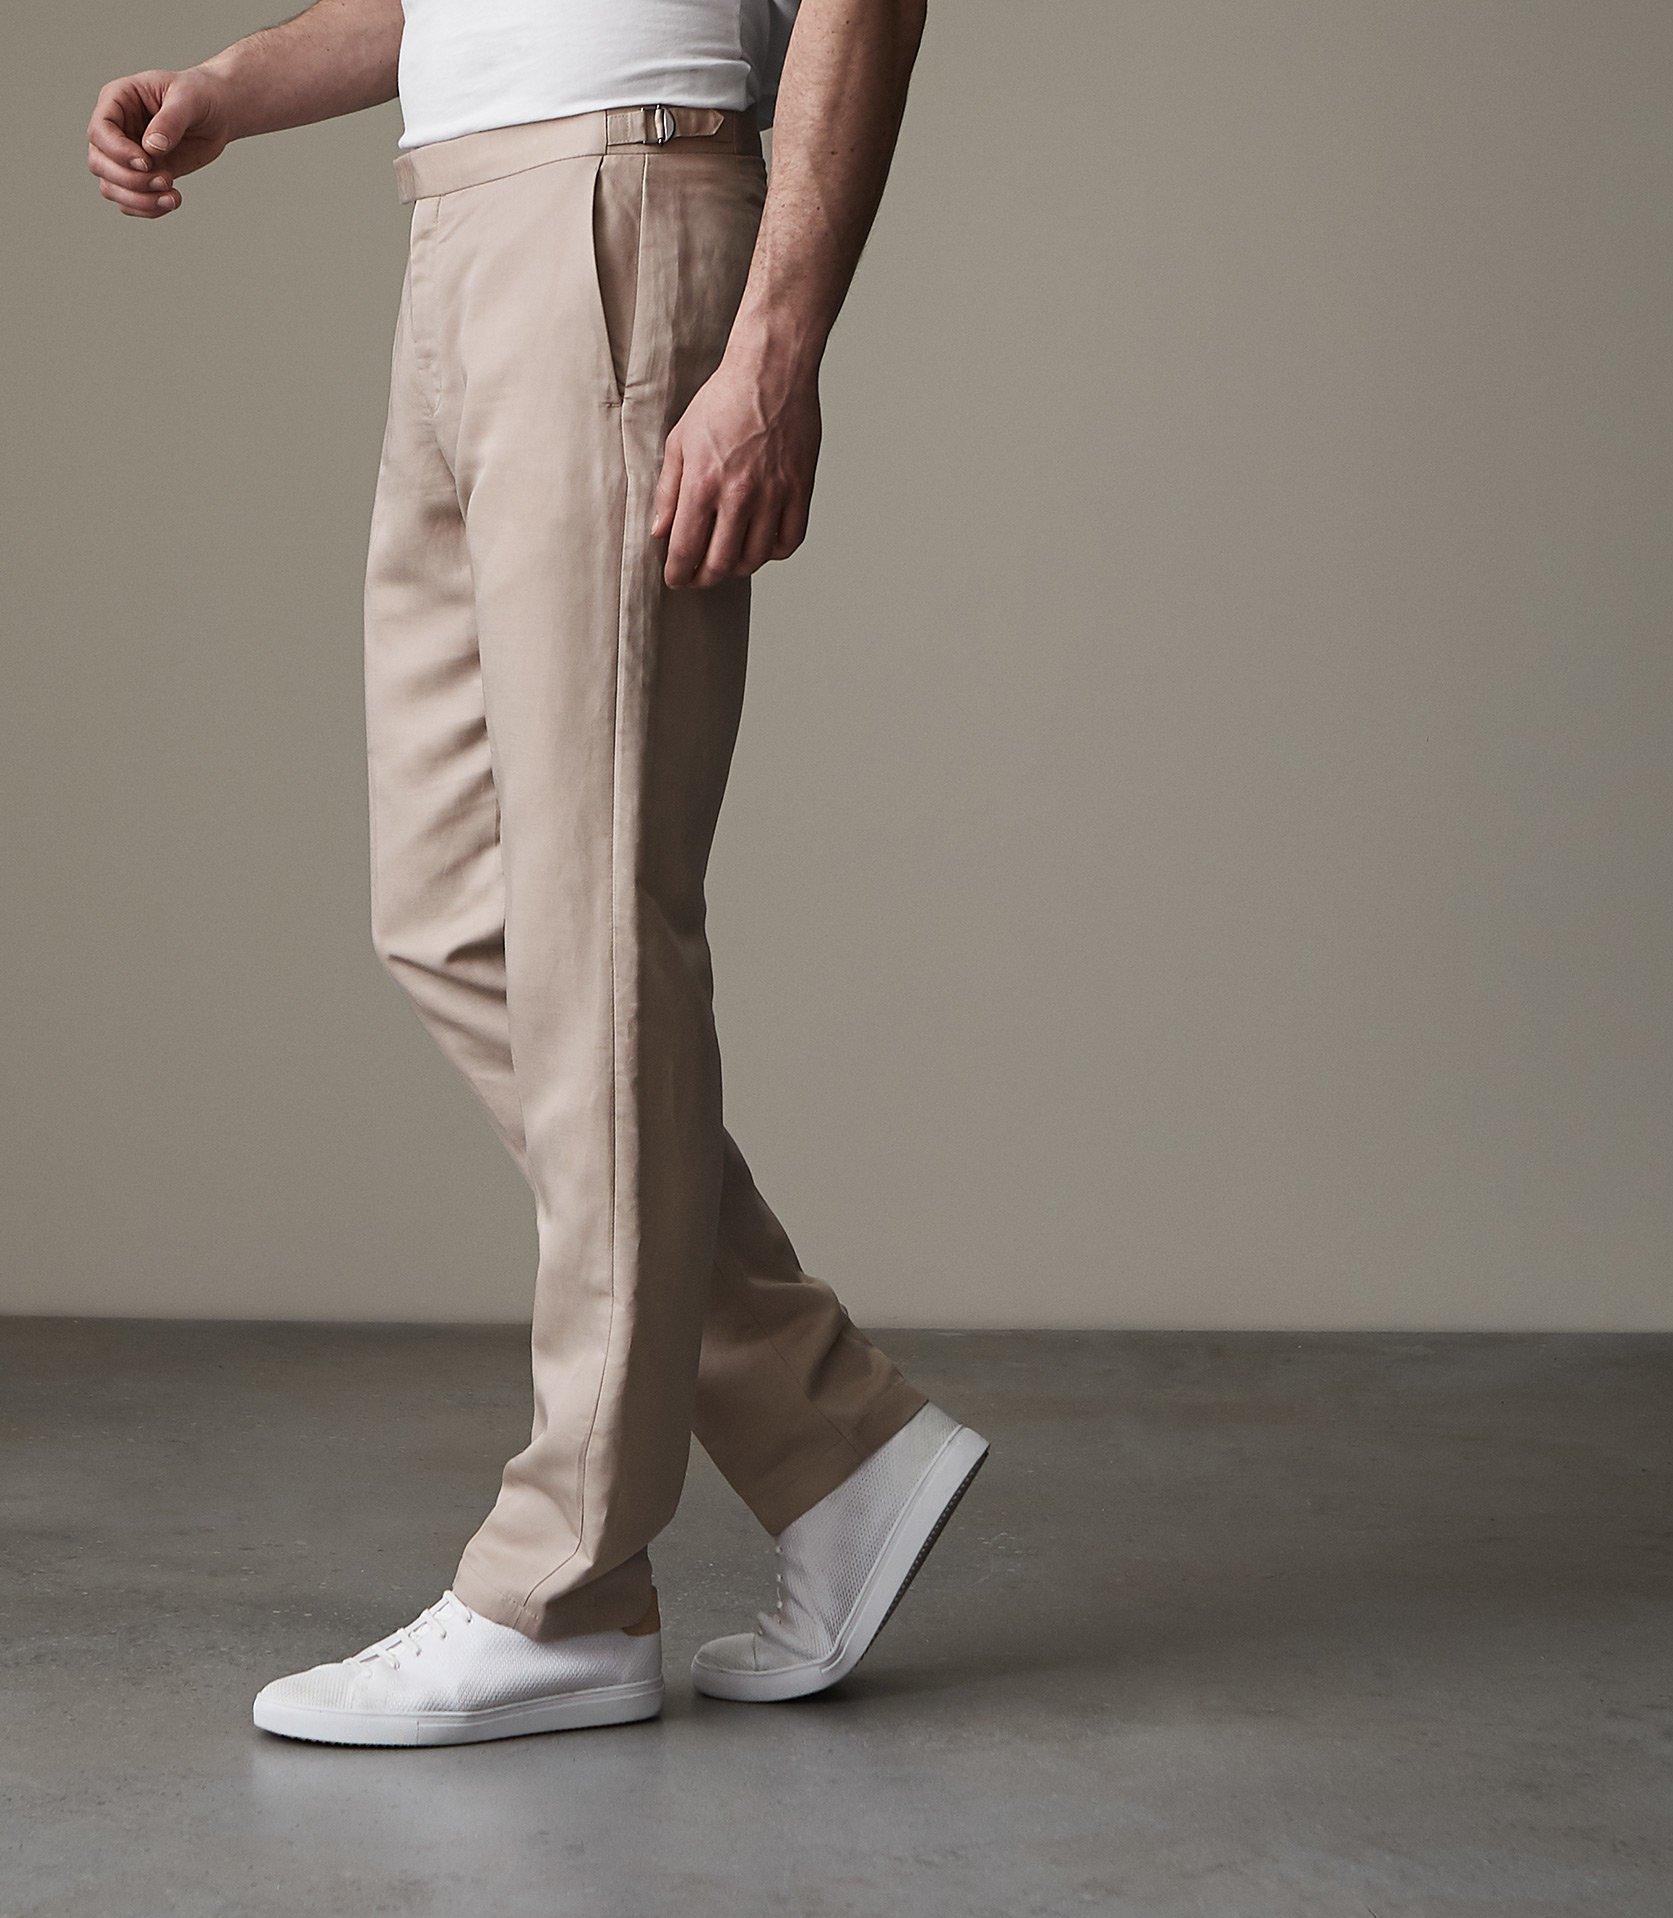 REISS trousers.jpg